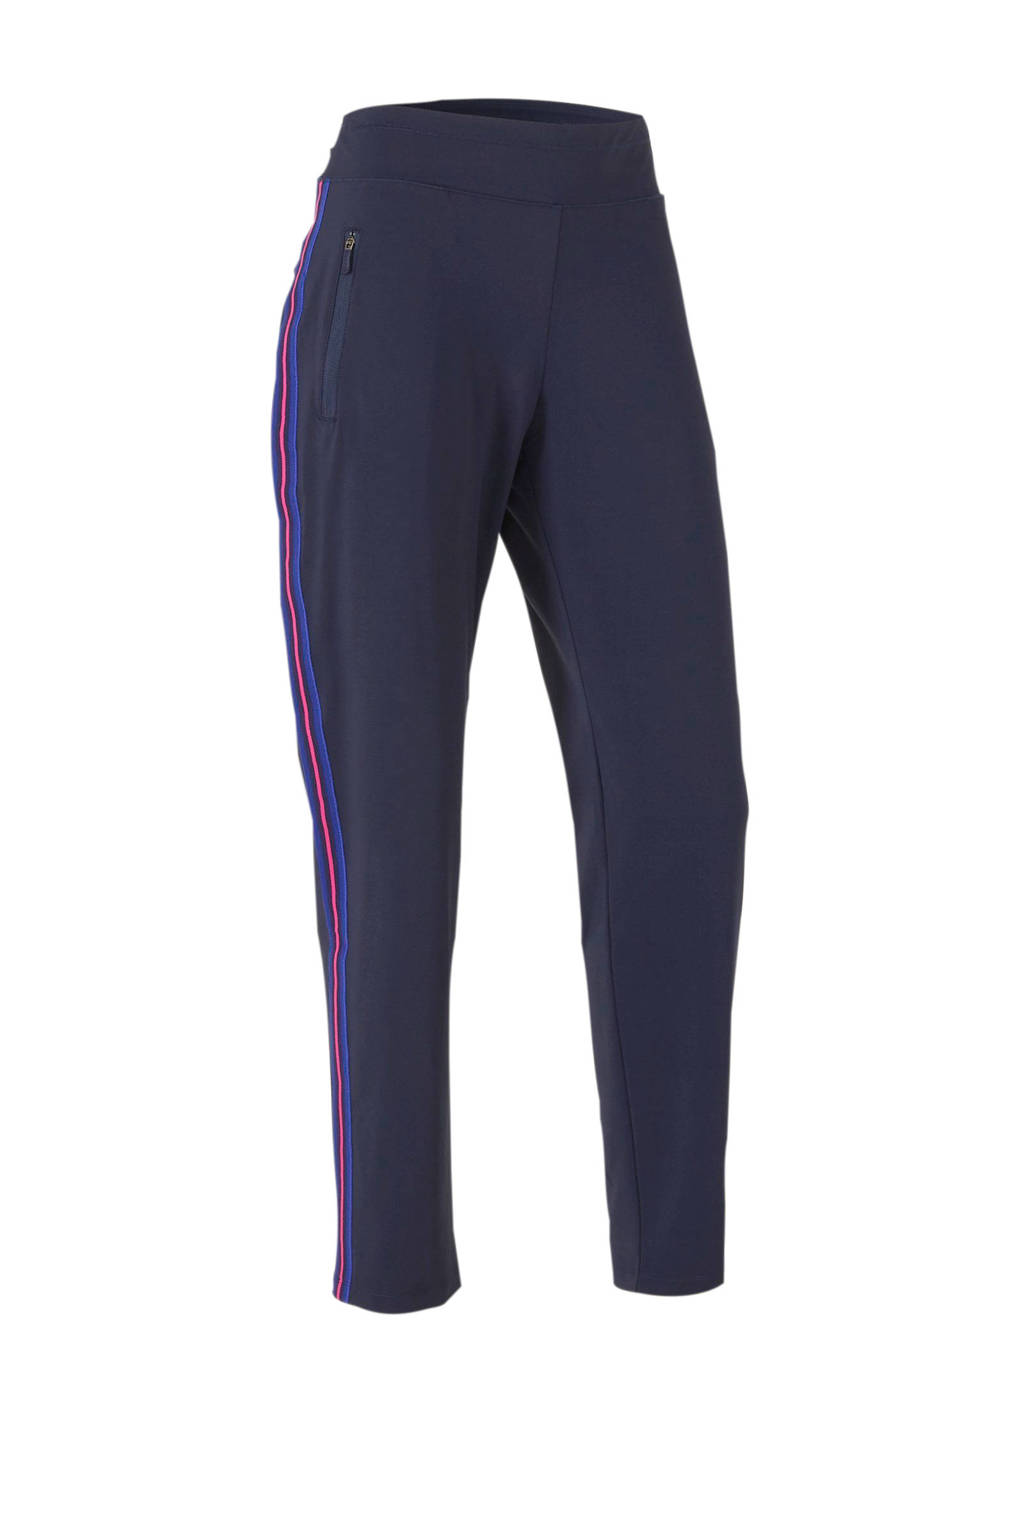 ESPRIT Women Sports broek donkerblauw, Donkerblauw/roze/blauw